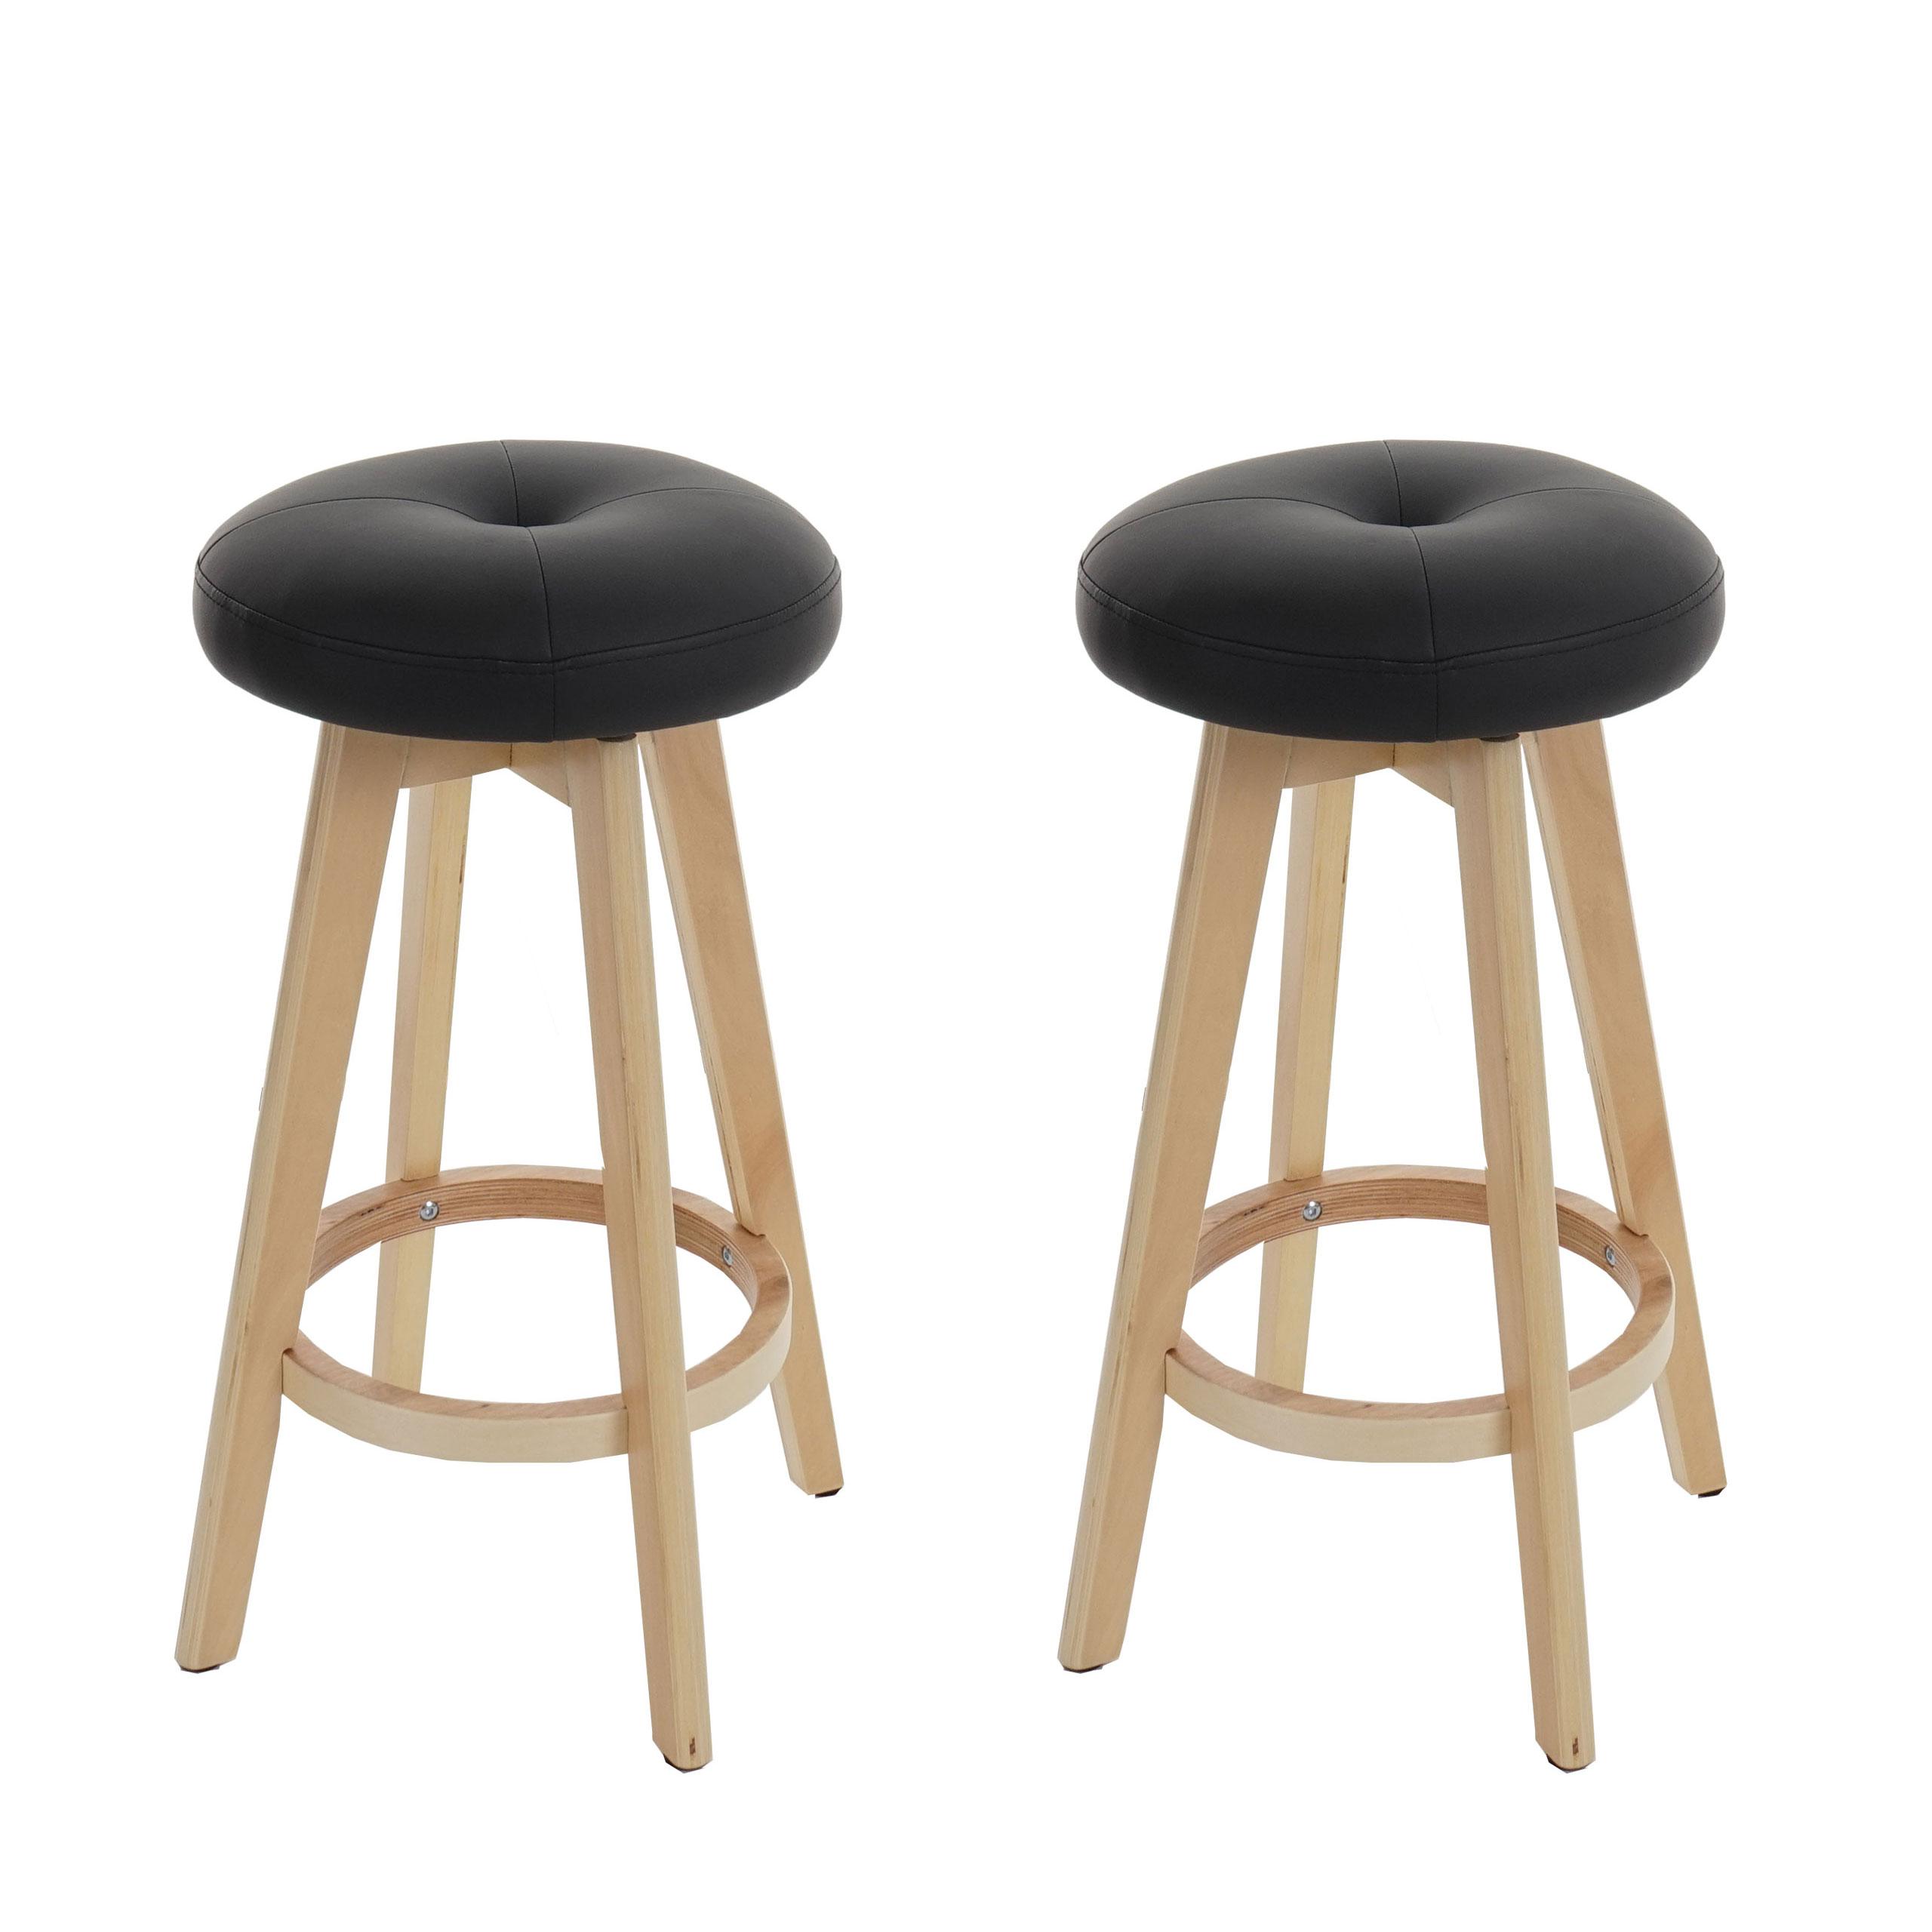 2x barhocker navan barstuhl tresenhocker holz kunstleder drehbar schwarz helle beine. Black Bedroom Furniture Sets. Home Design Ideas